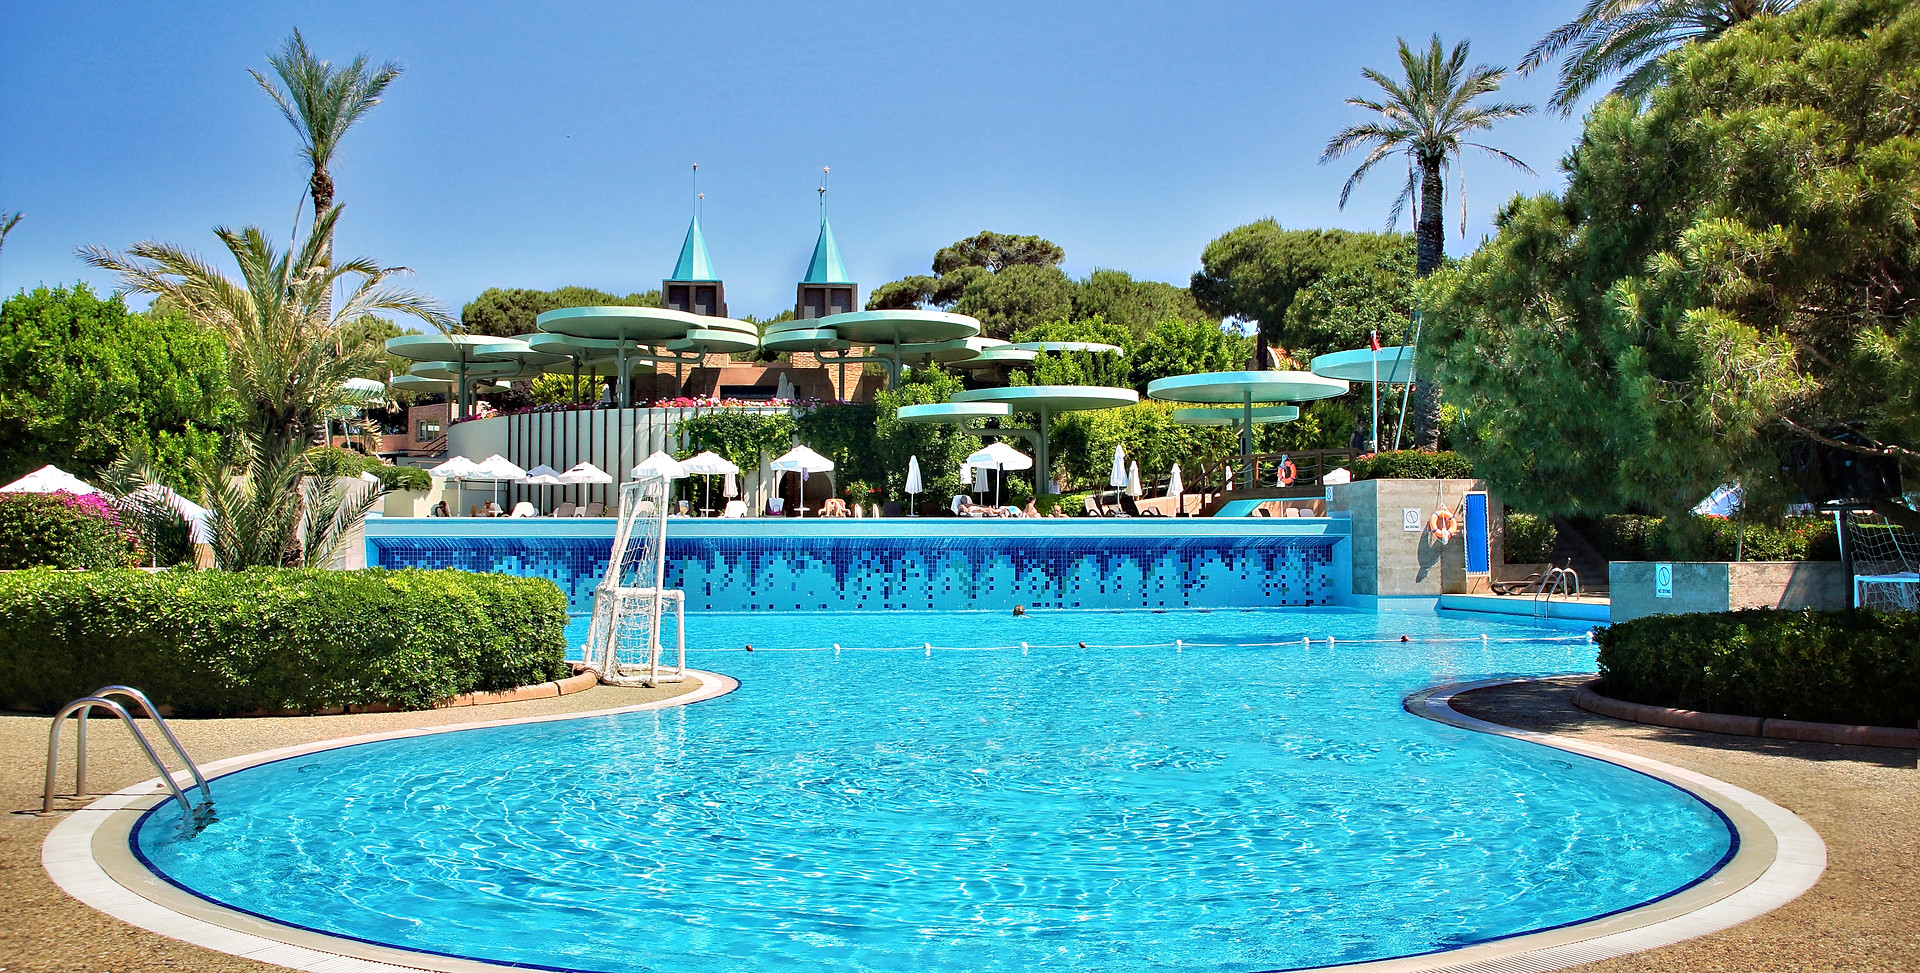 Gloria_verde_resort_puregolf-travel (17)